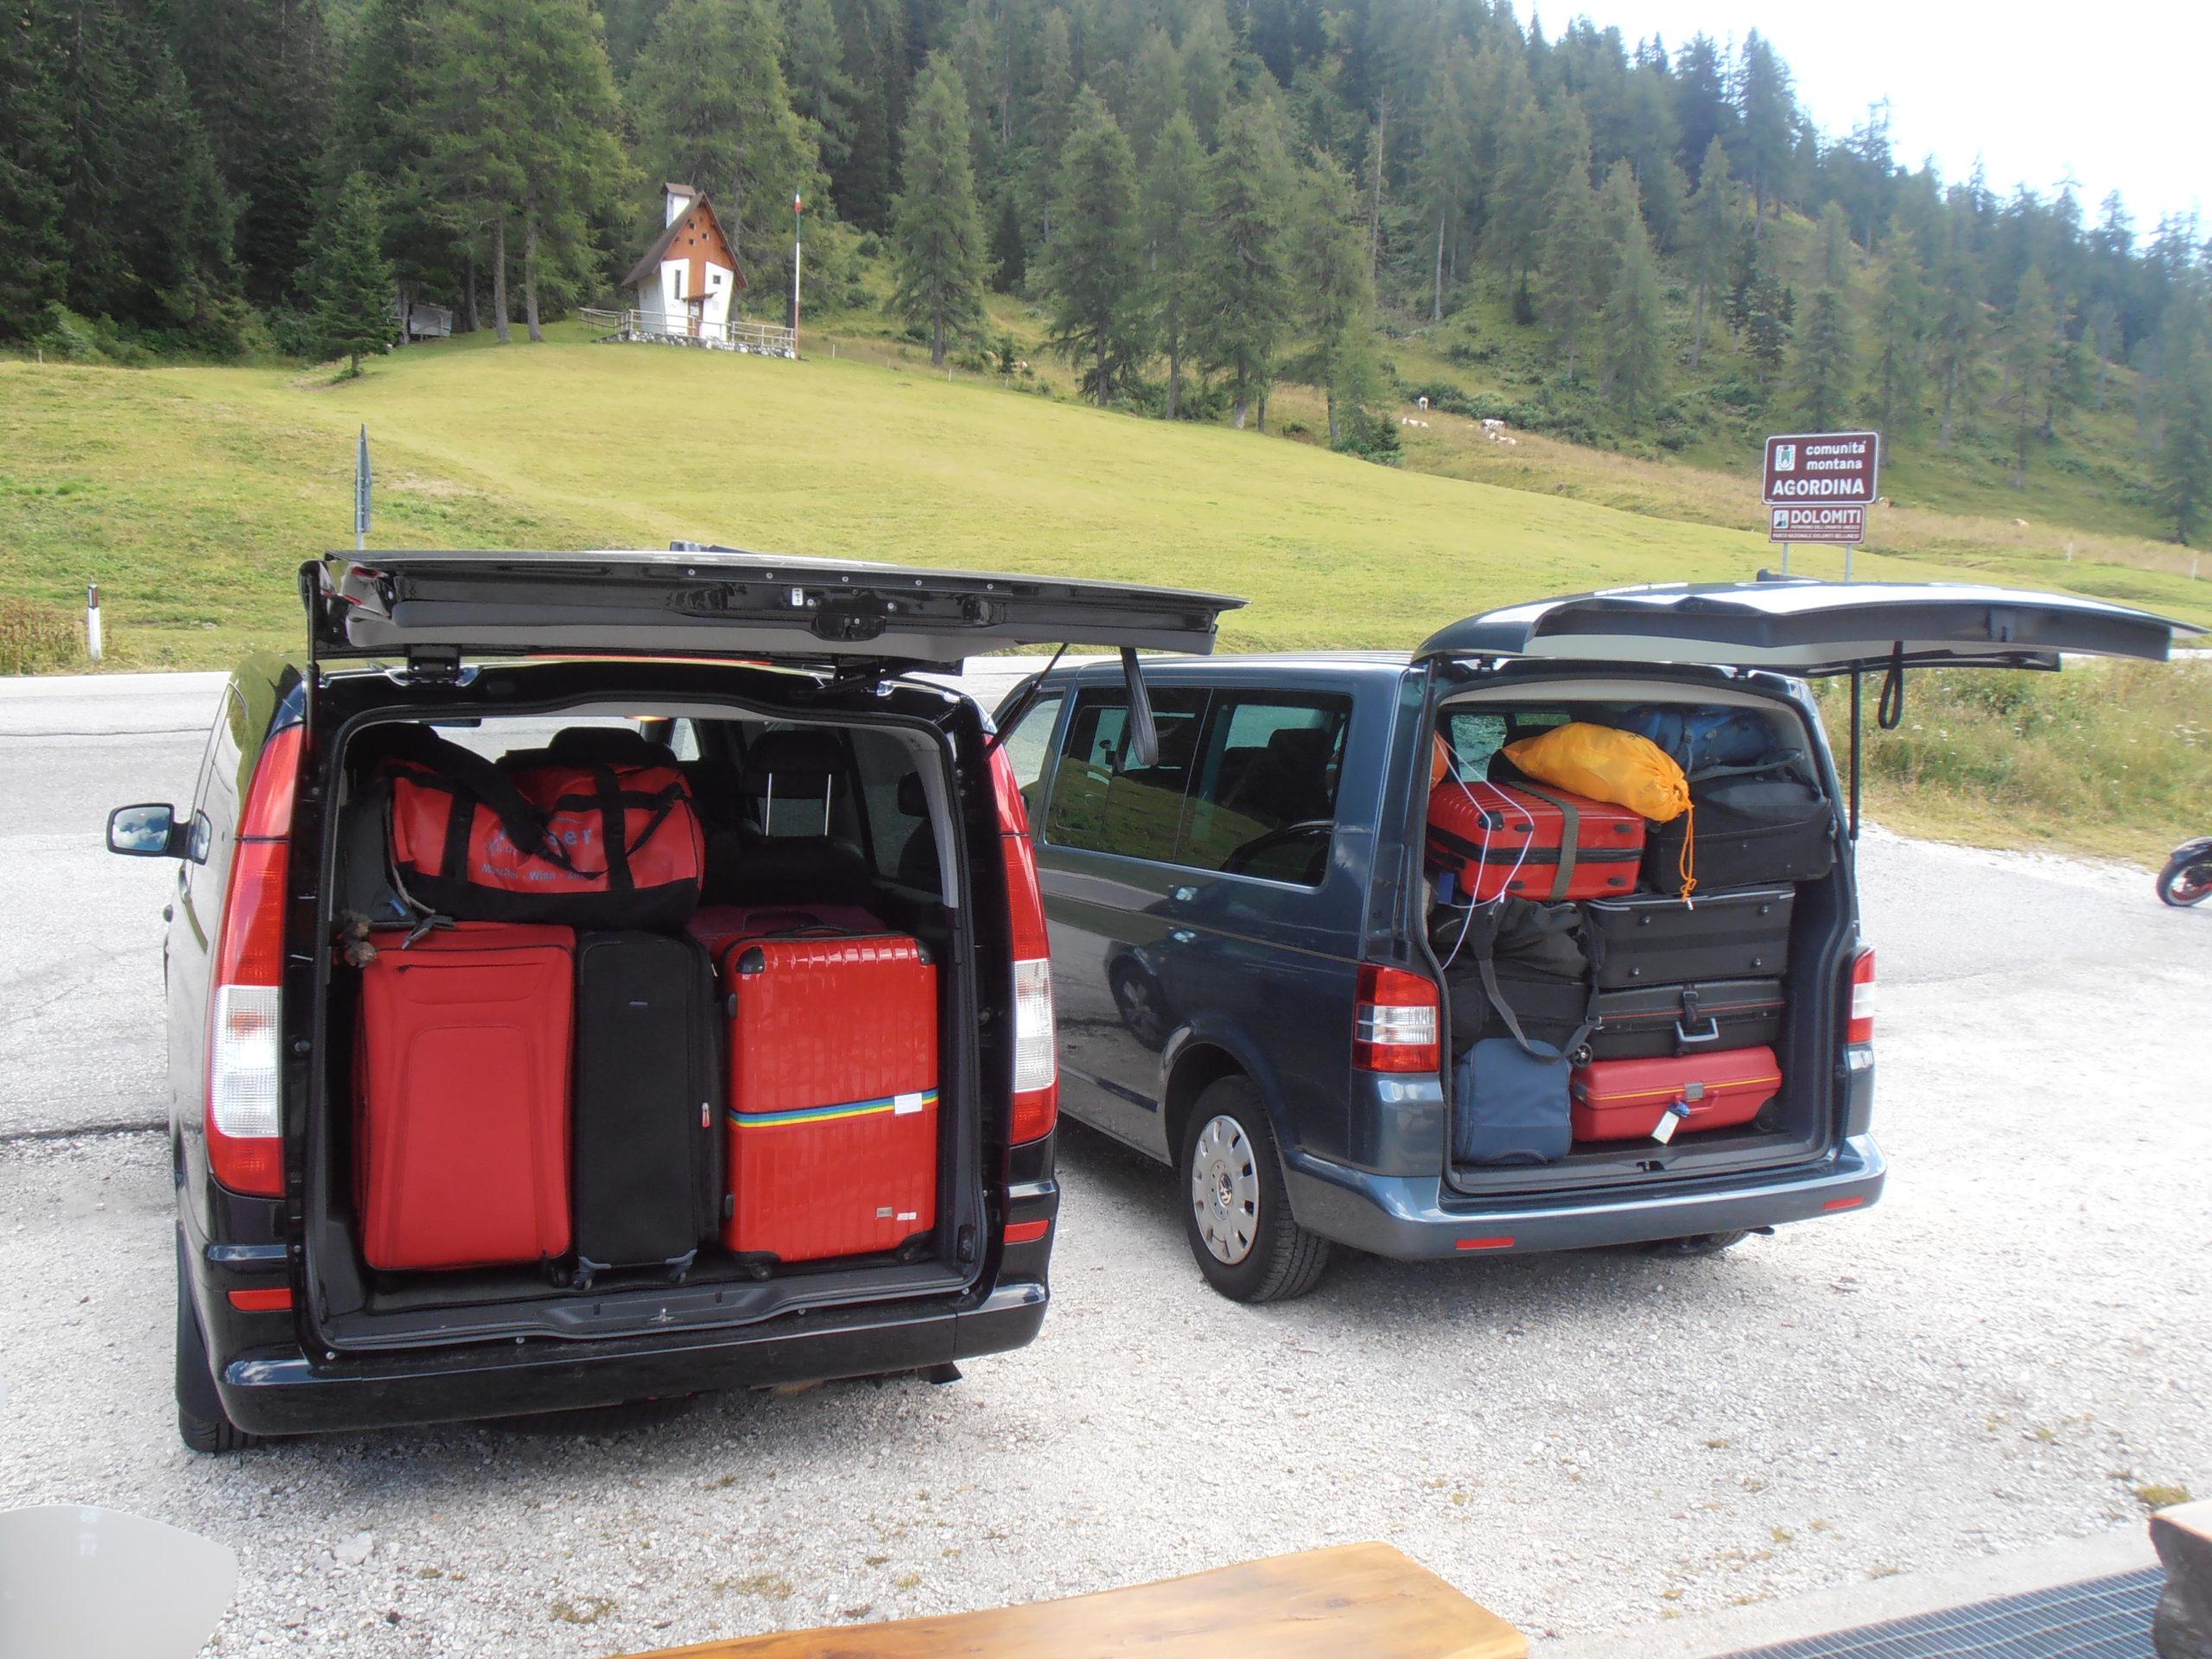 trasporto persone bagagli alta via 6 personengepäck transportieren av6